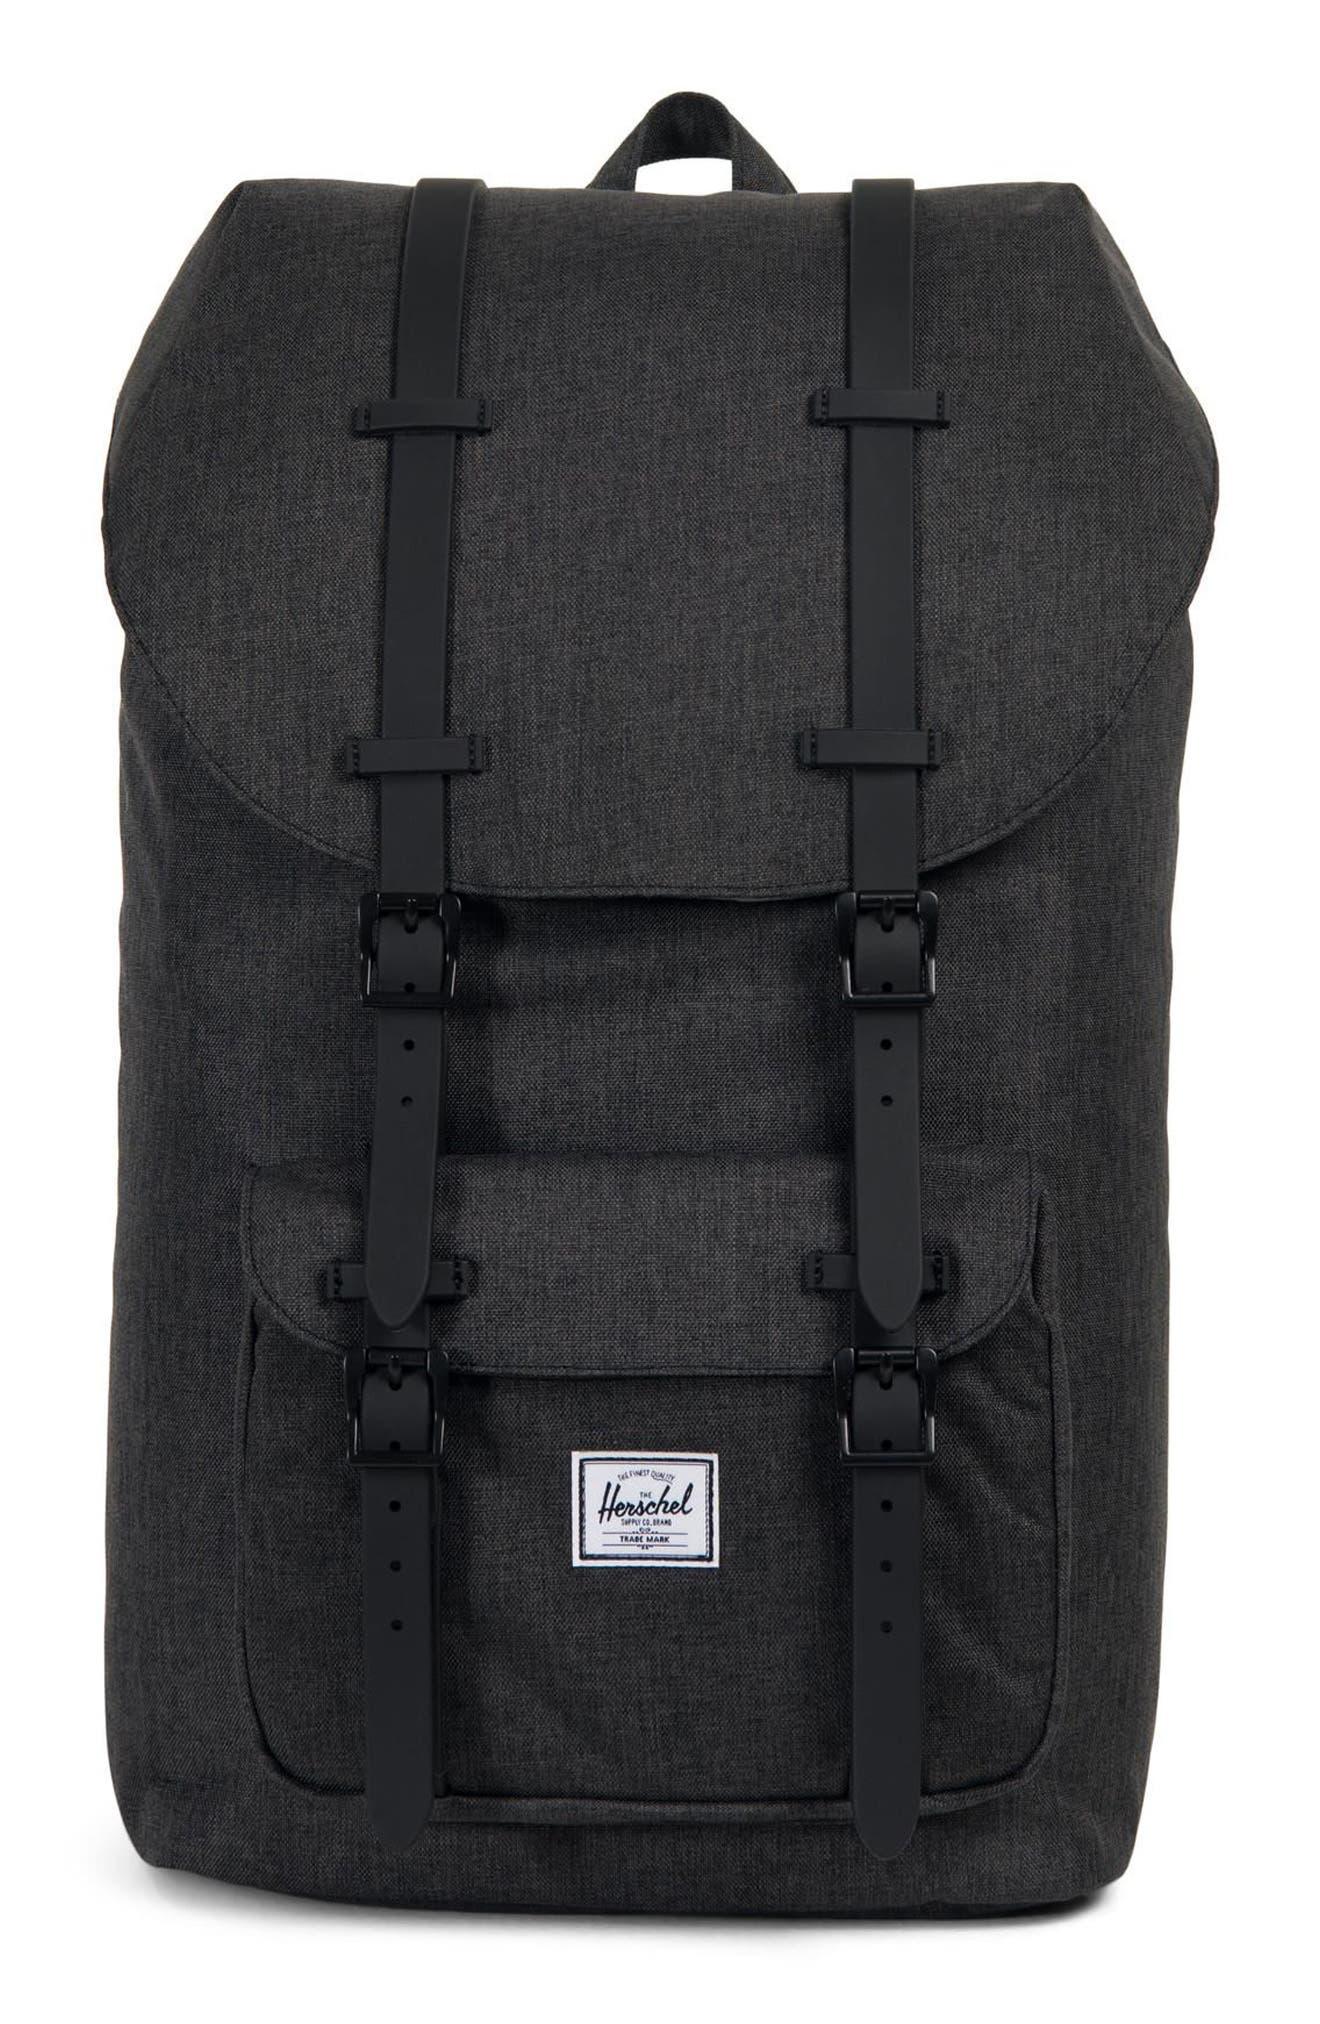 HERSCHEL SUPPLY CO. Little America Backpack - Black in Black Crosshatch/ Black Rubber